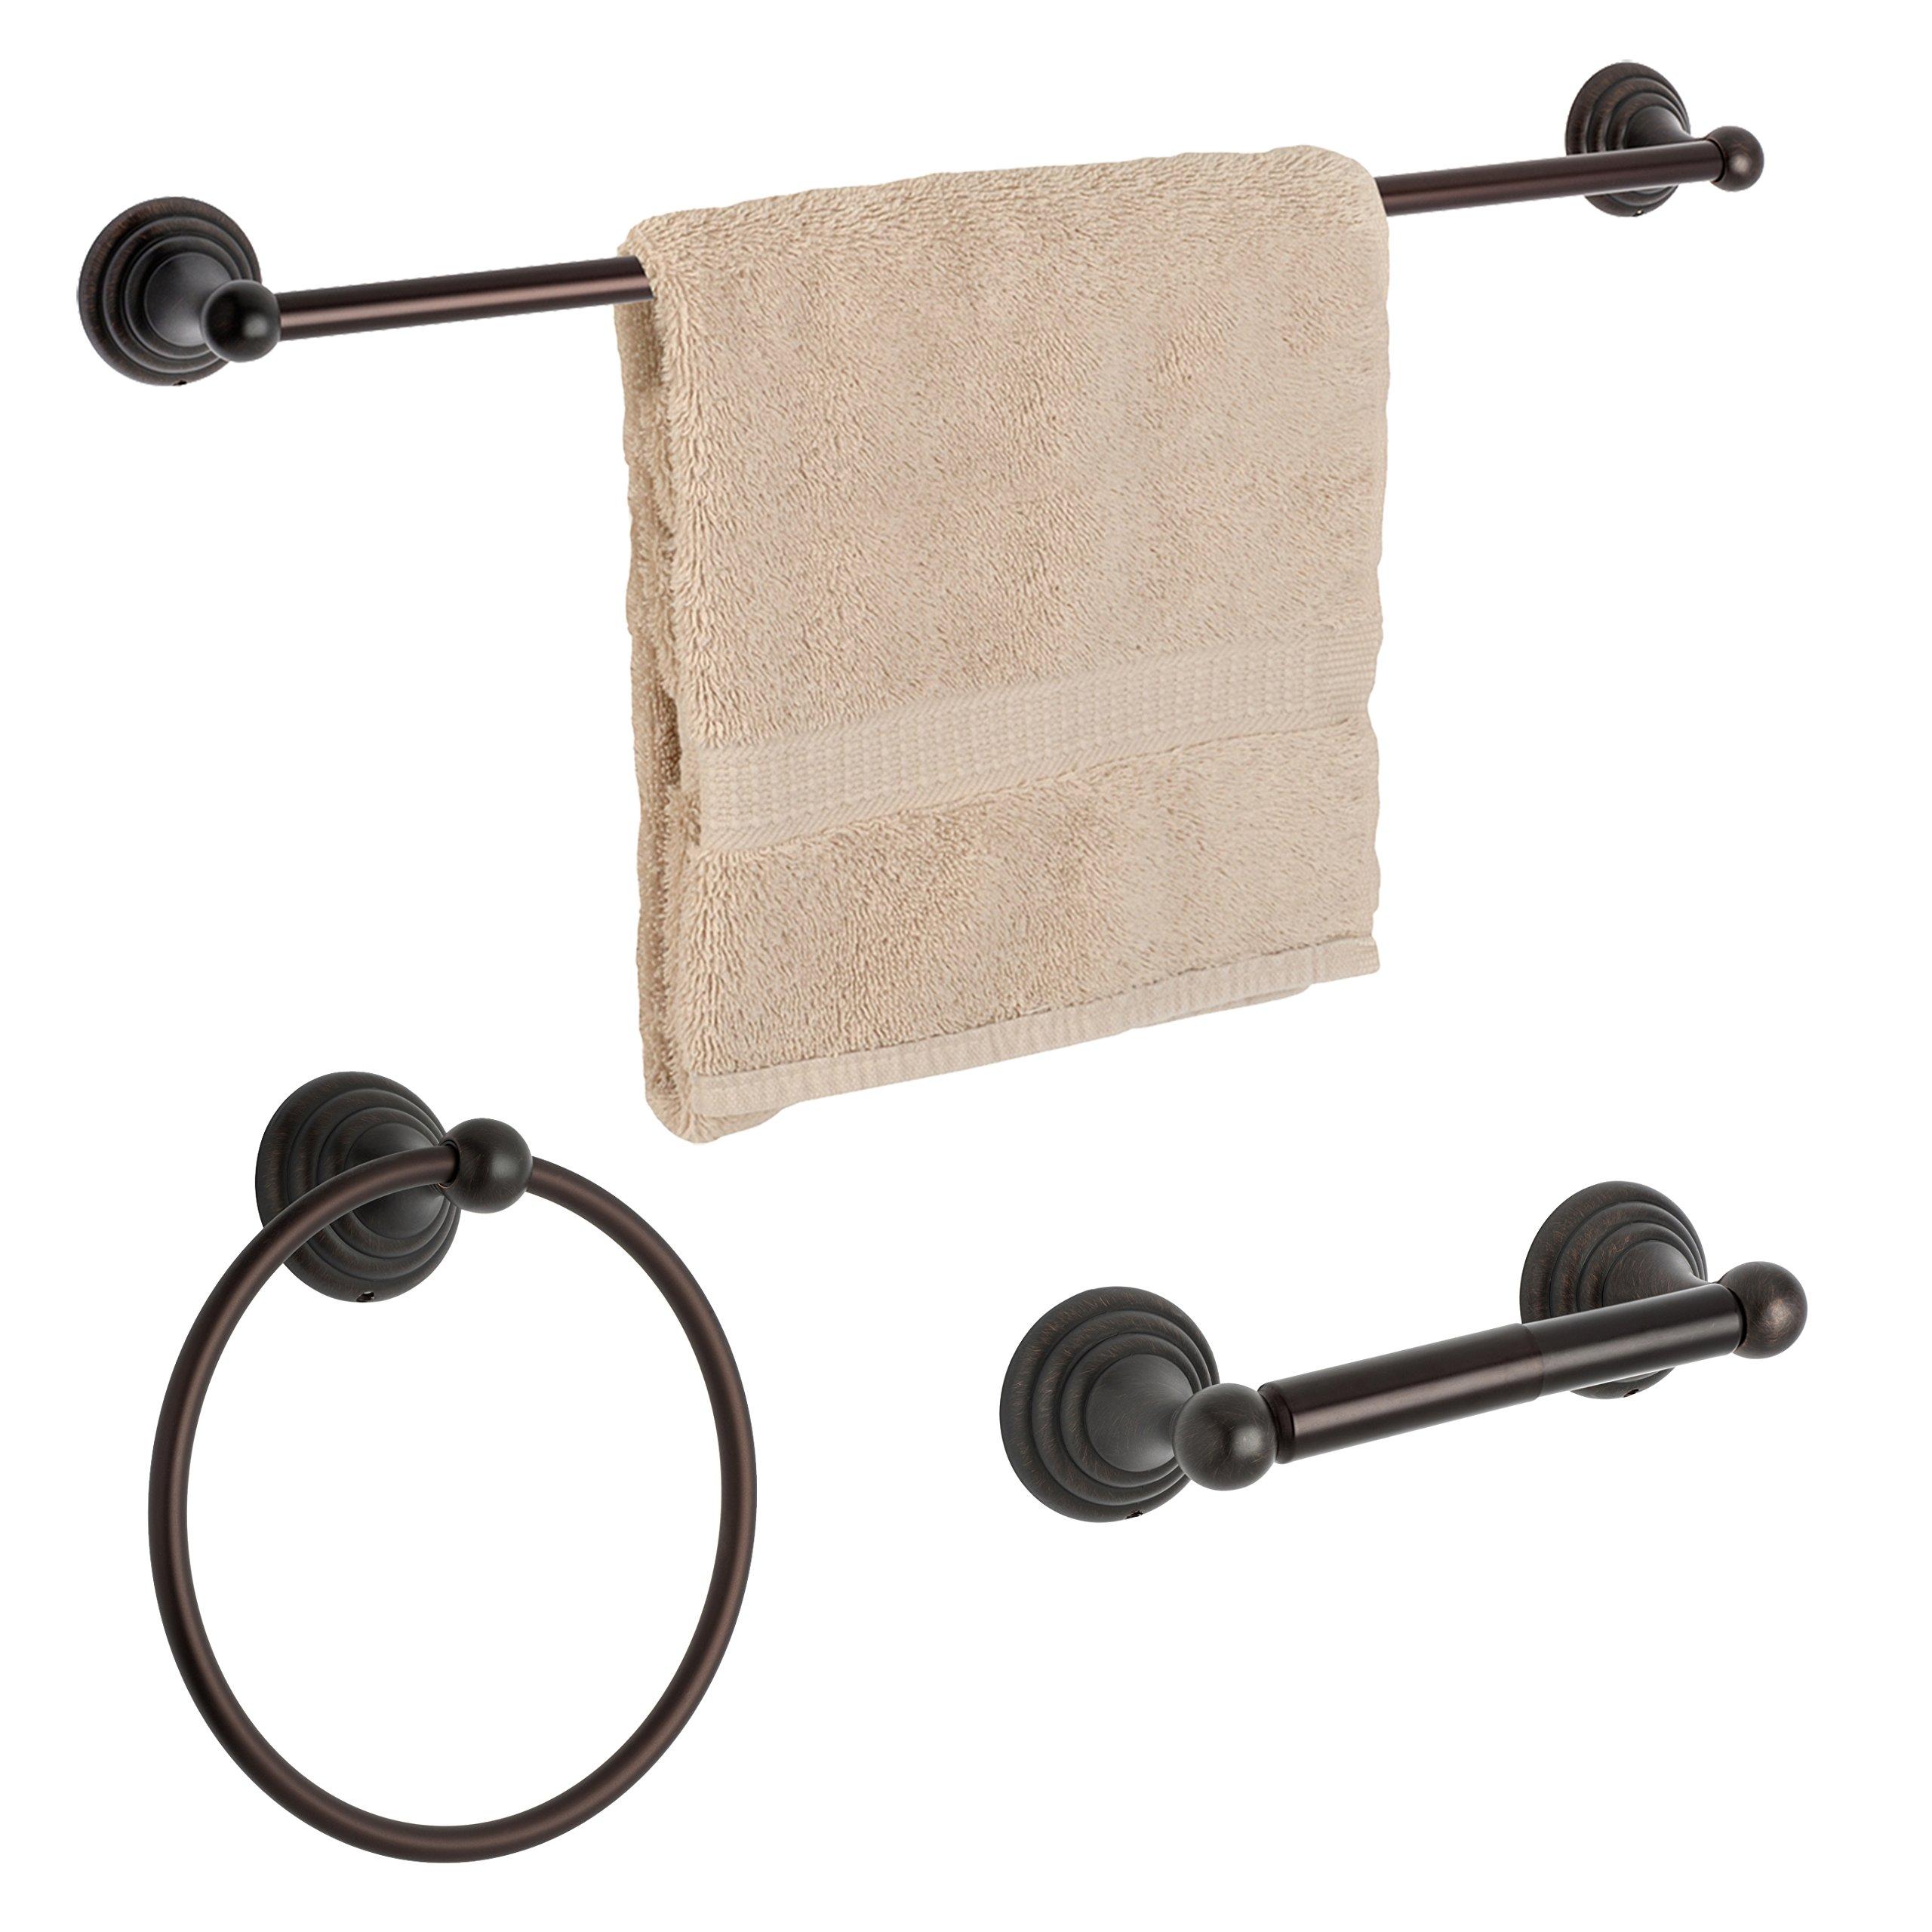 Dynasty Hardware DYN-7500-ORB-3 Bel-Air Bathroom Hardware 3-Piece Set, with 24'', 24 Inch Towel Bar, Oil Rubbed Bronze